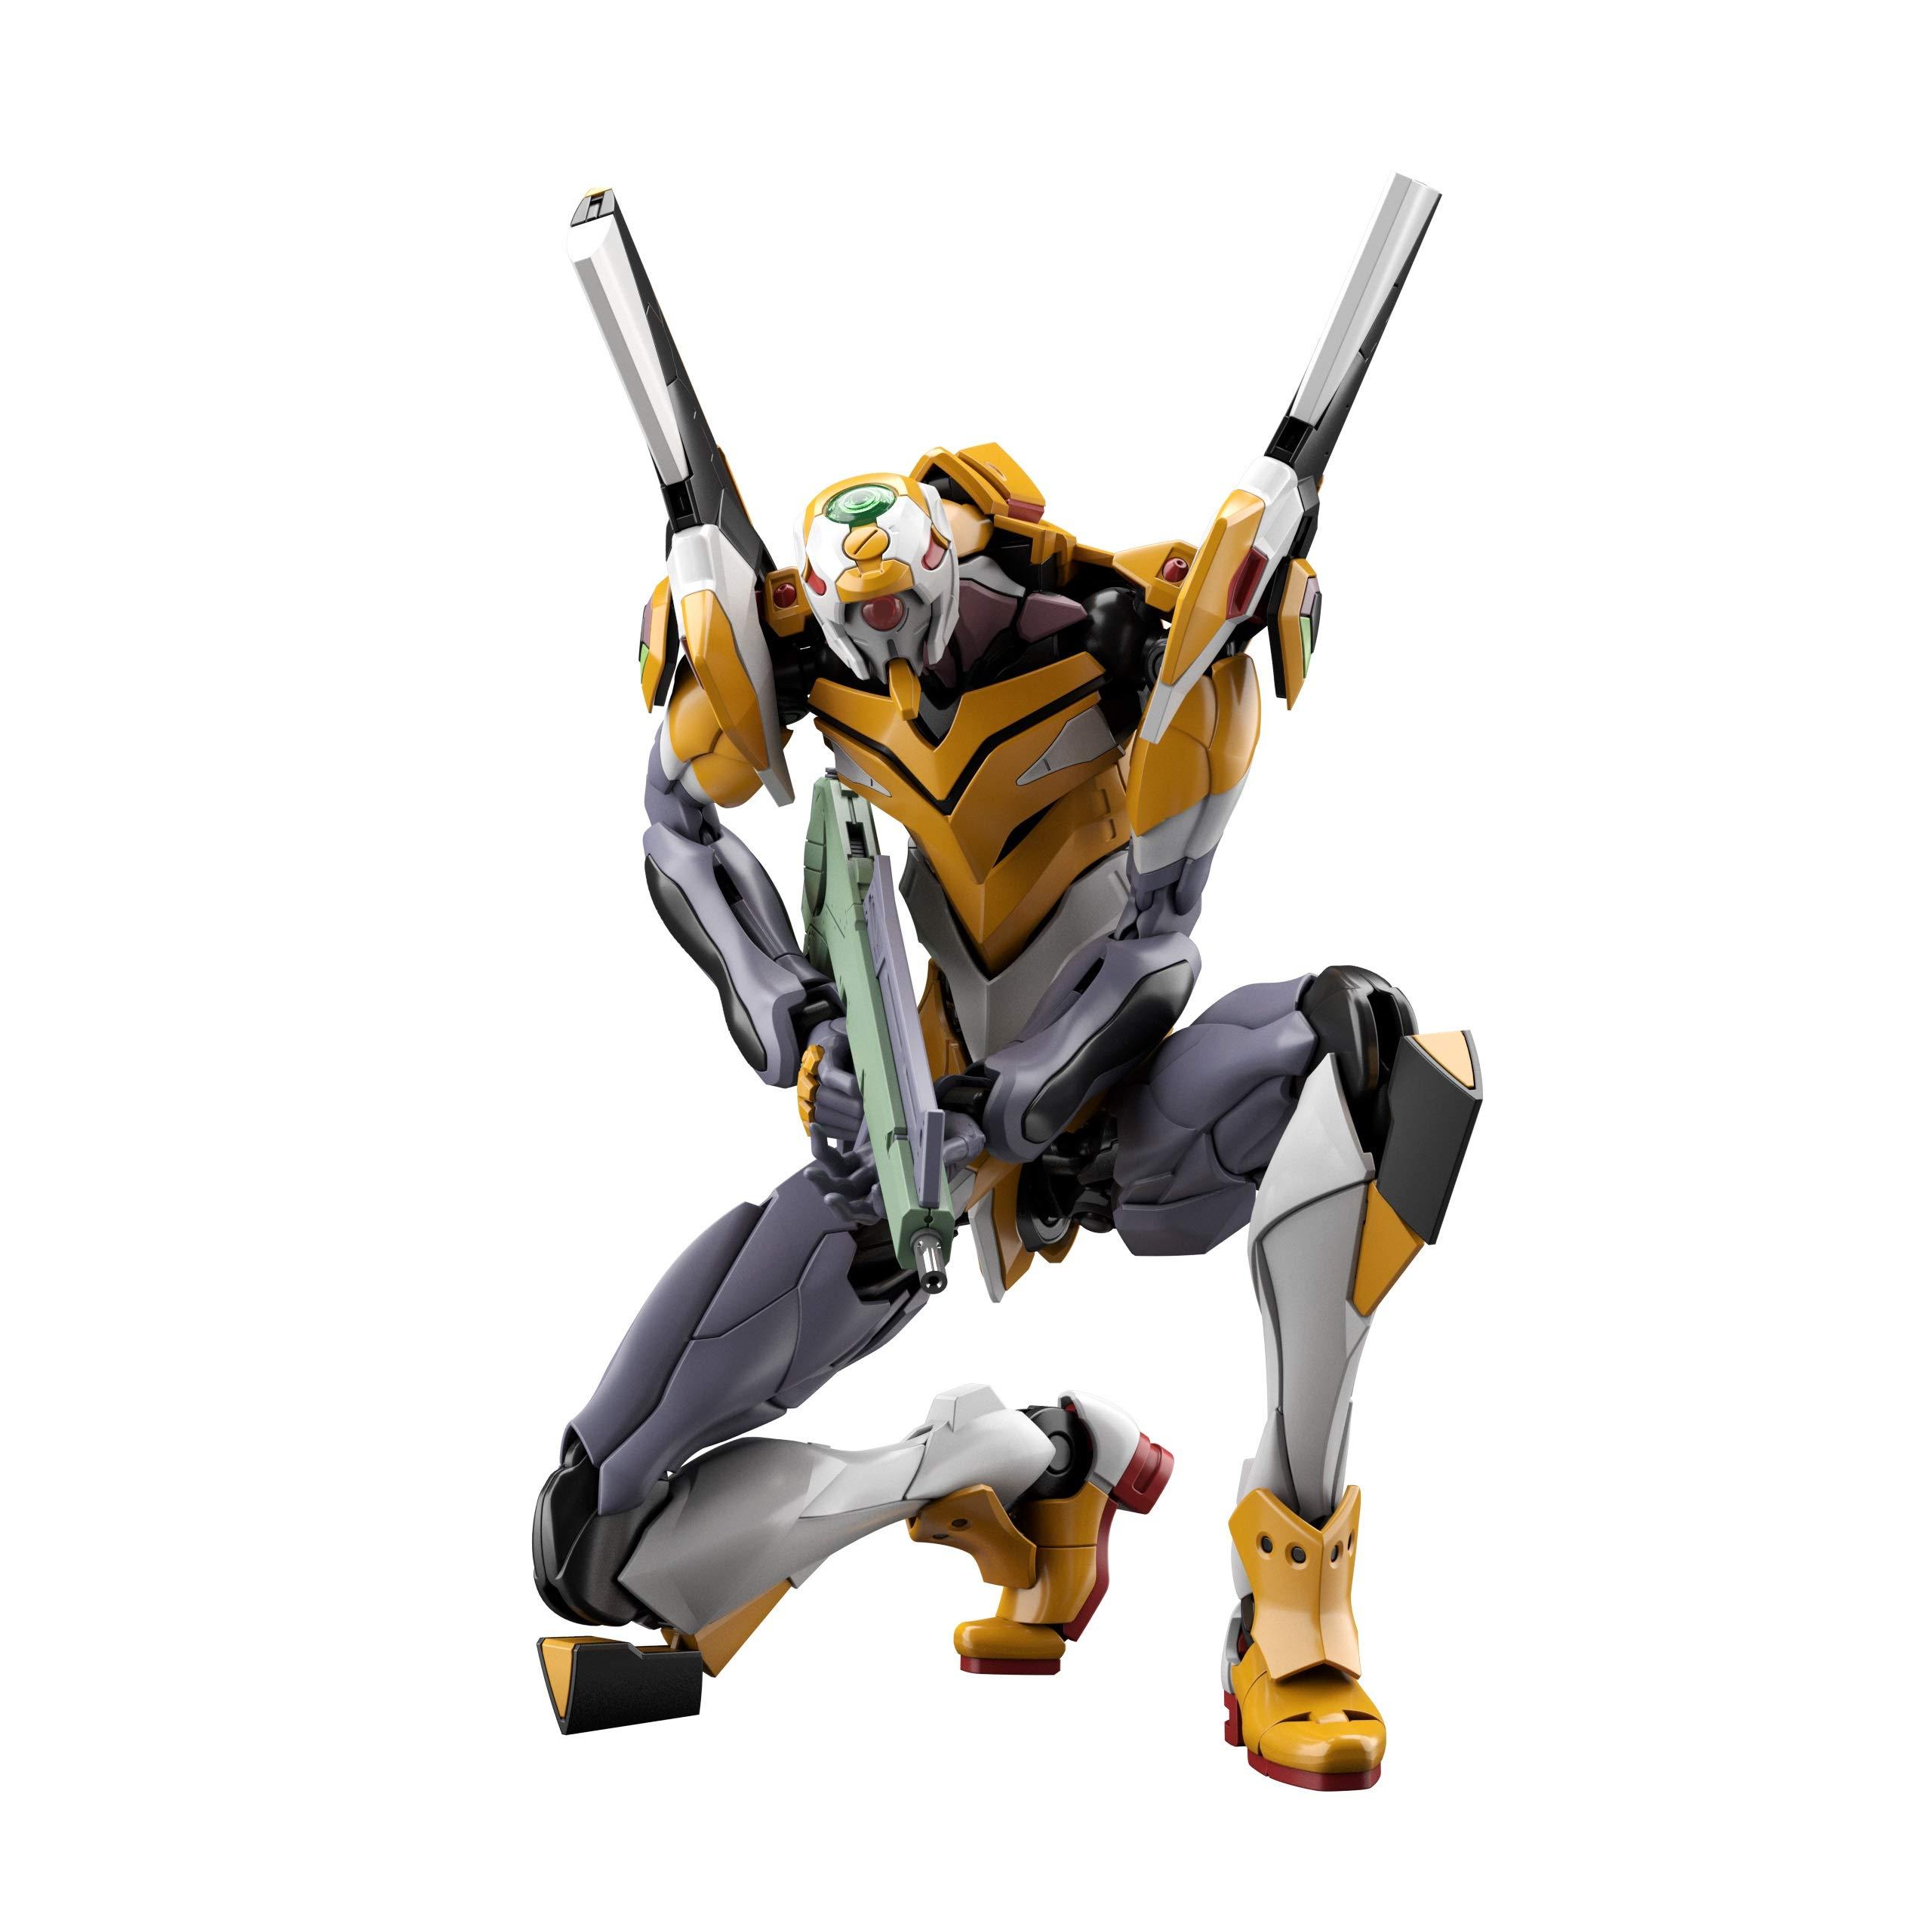 『RG 汎用ヒト型決戦兵器 人造人間エヴァンゲリオン試作零号機』が6月に発売!【プラモデル】